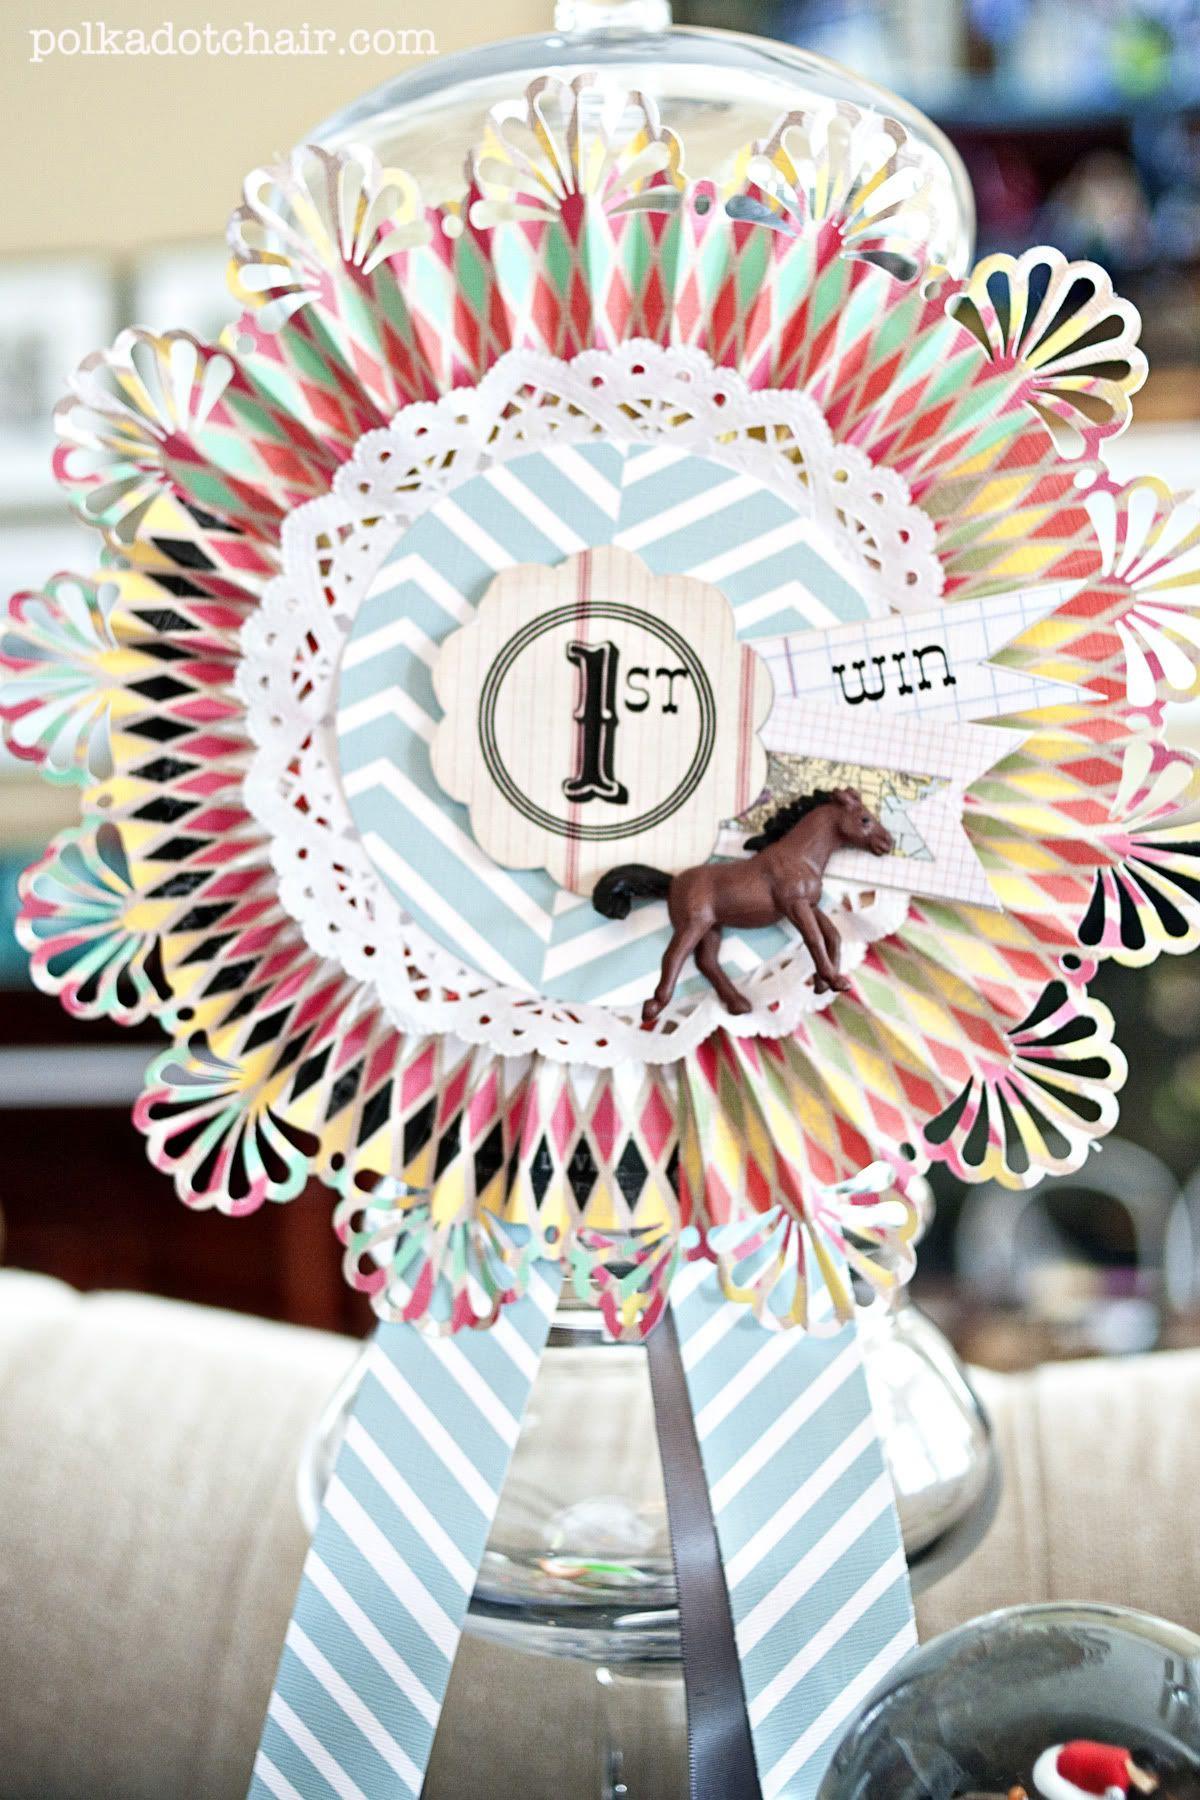 Kentucky Derby Decoration Ideas Centerpieces Louisville Blogger Blog